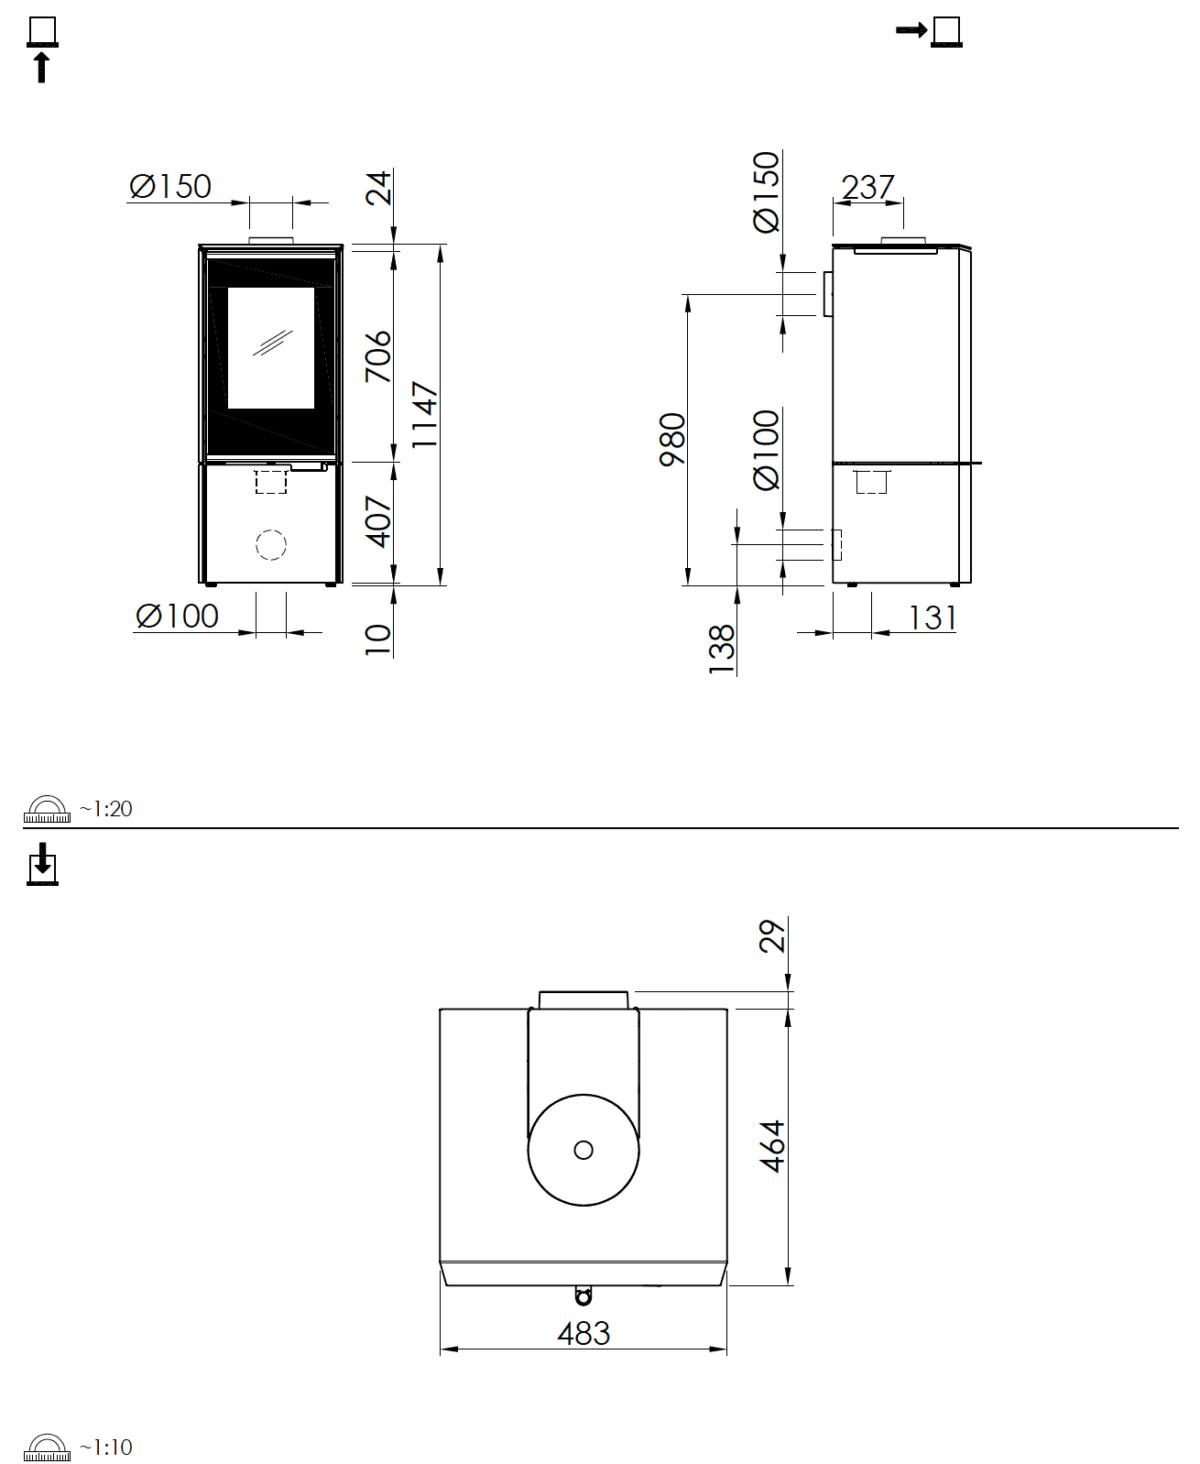 spartherm-ambiente-a9-line_image